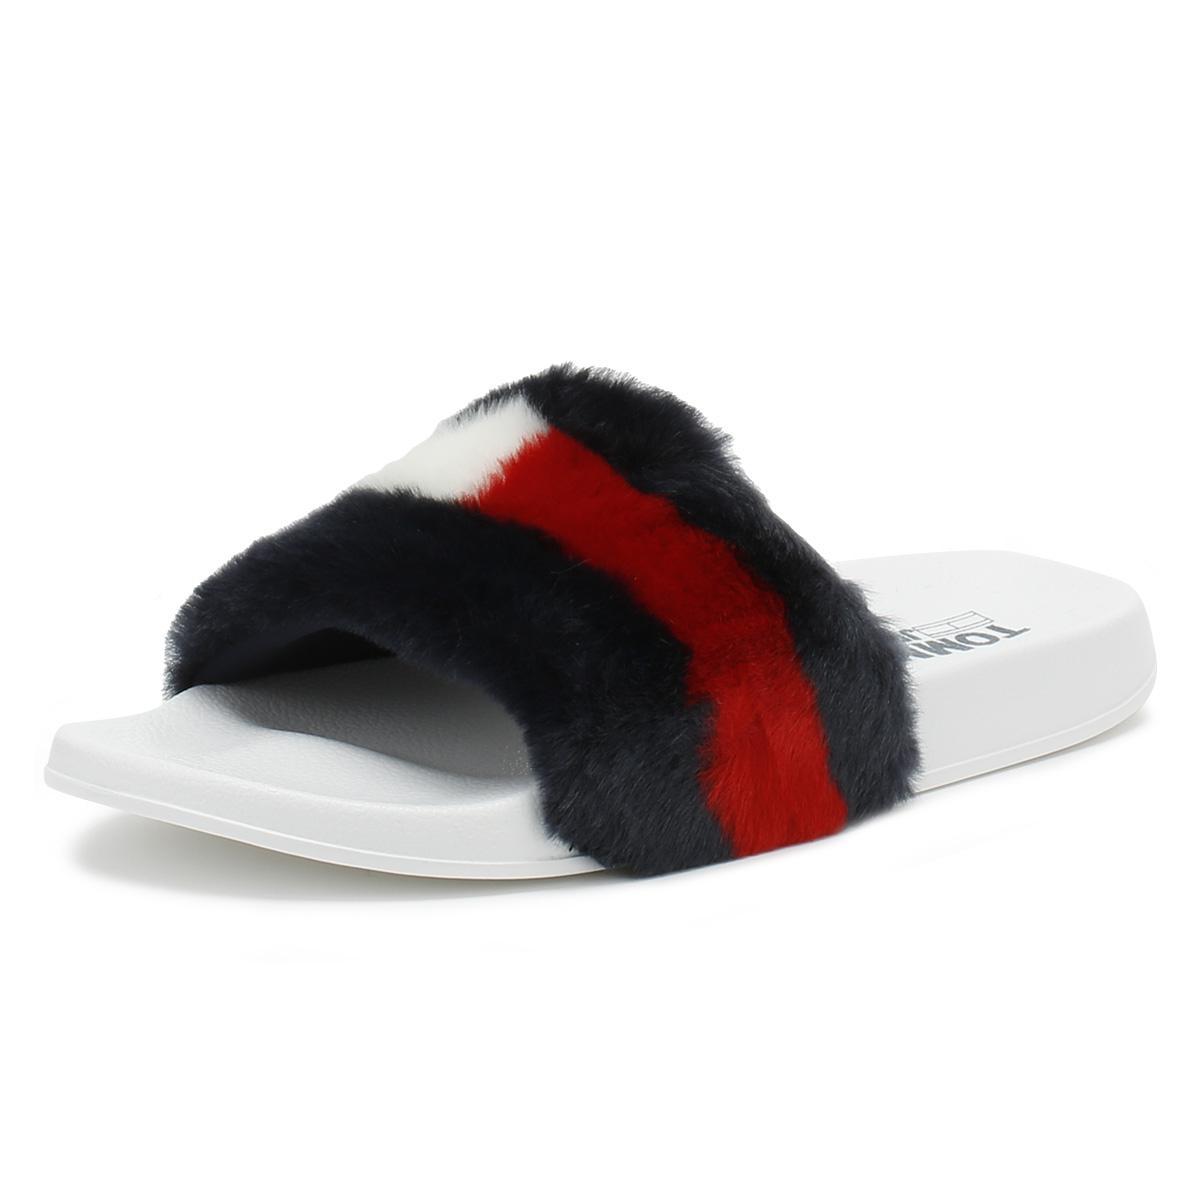 64ec93be297 Tommy Hilfiger - Multicolor Womens Rwb Funny Fur Pool Slides - Lyst. View  fullscreen